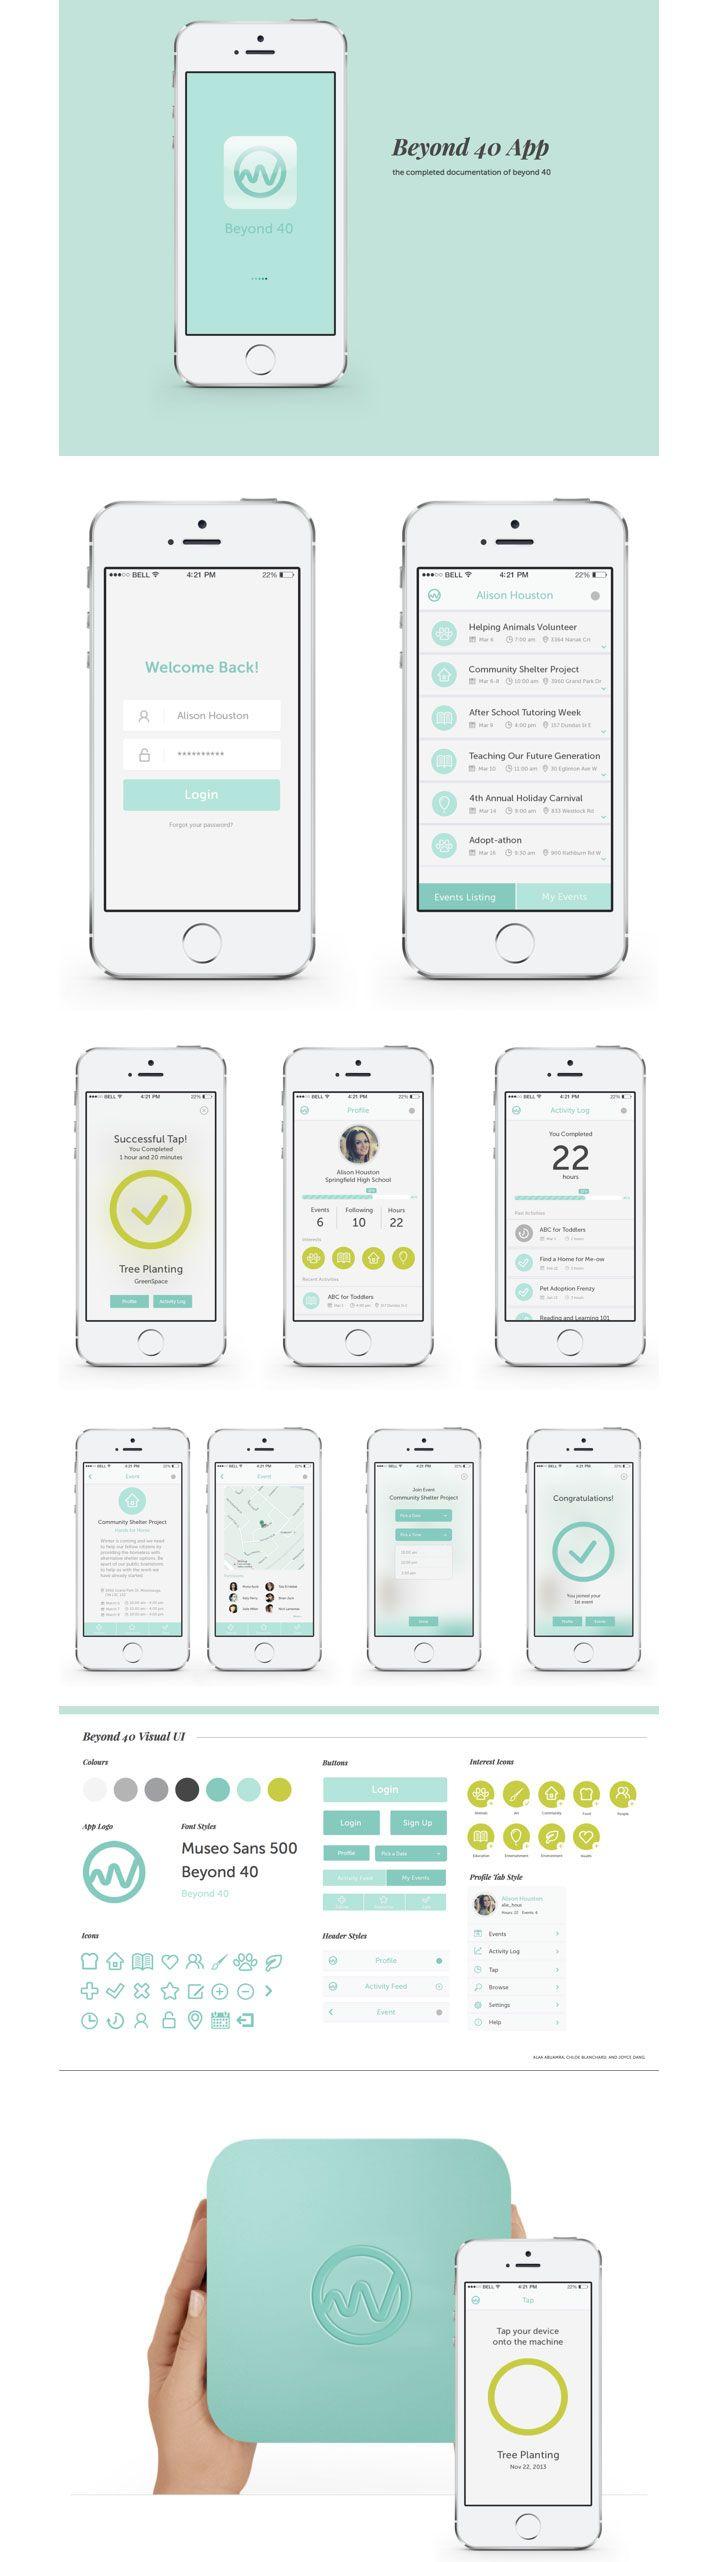 Beyond 40 App Design